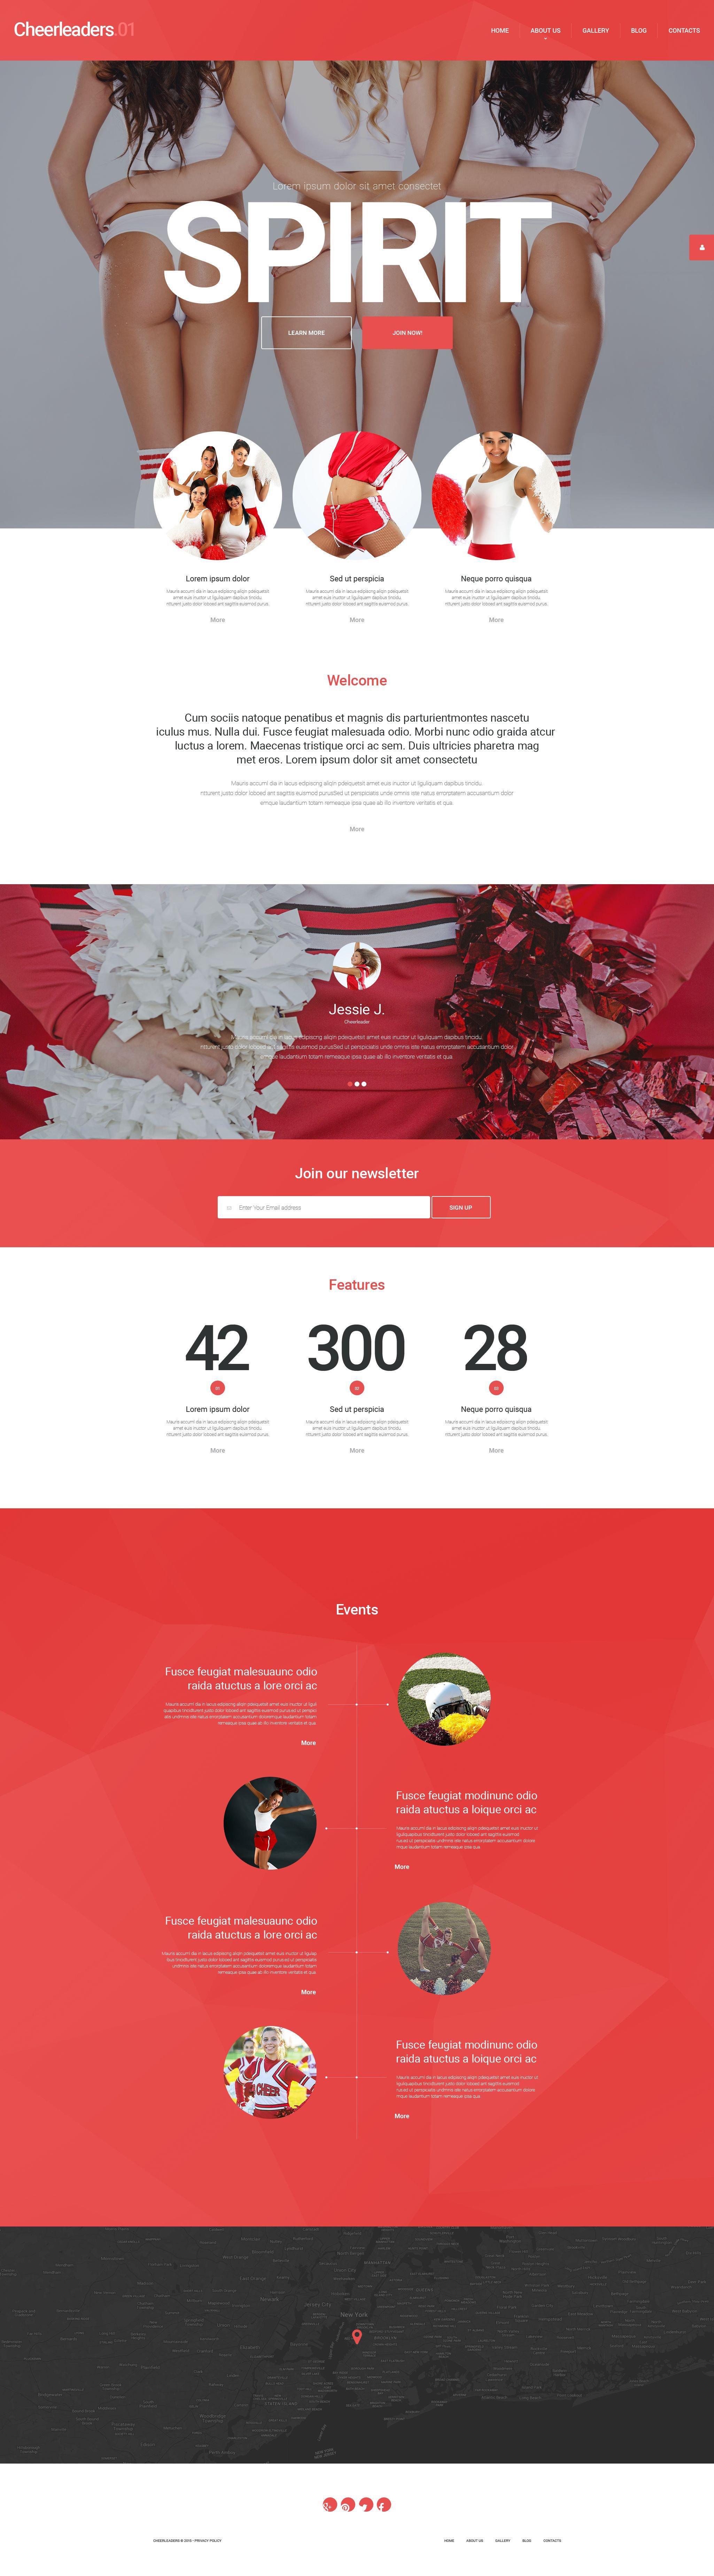 "WordPress Theme namens ""Energetic Cheerleaders"" #54993 - Screenshot"